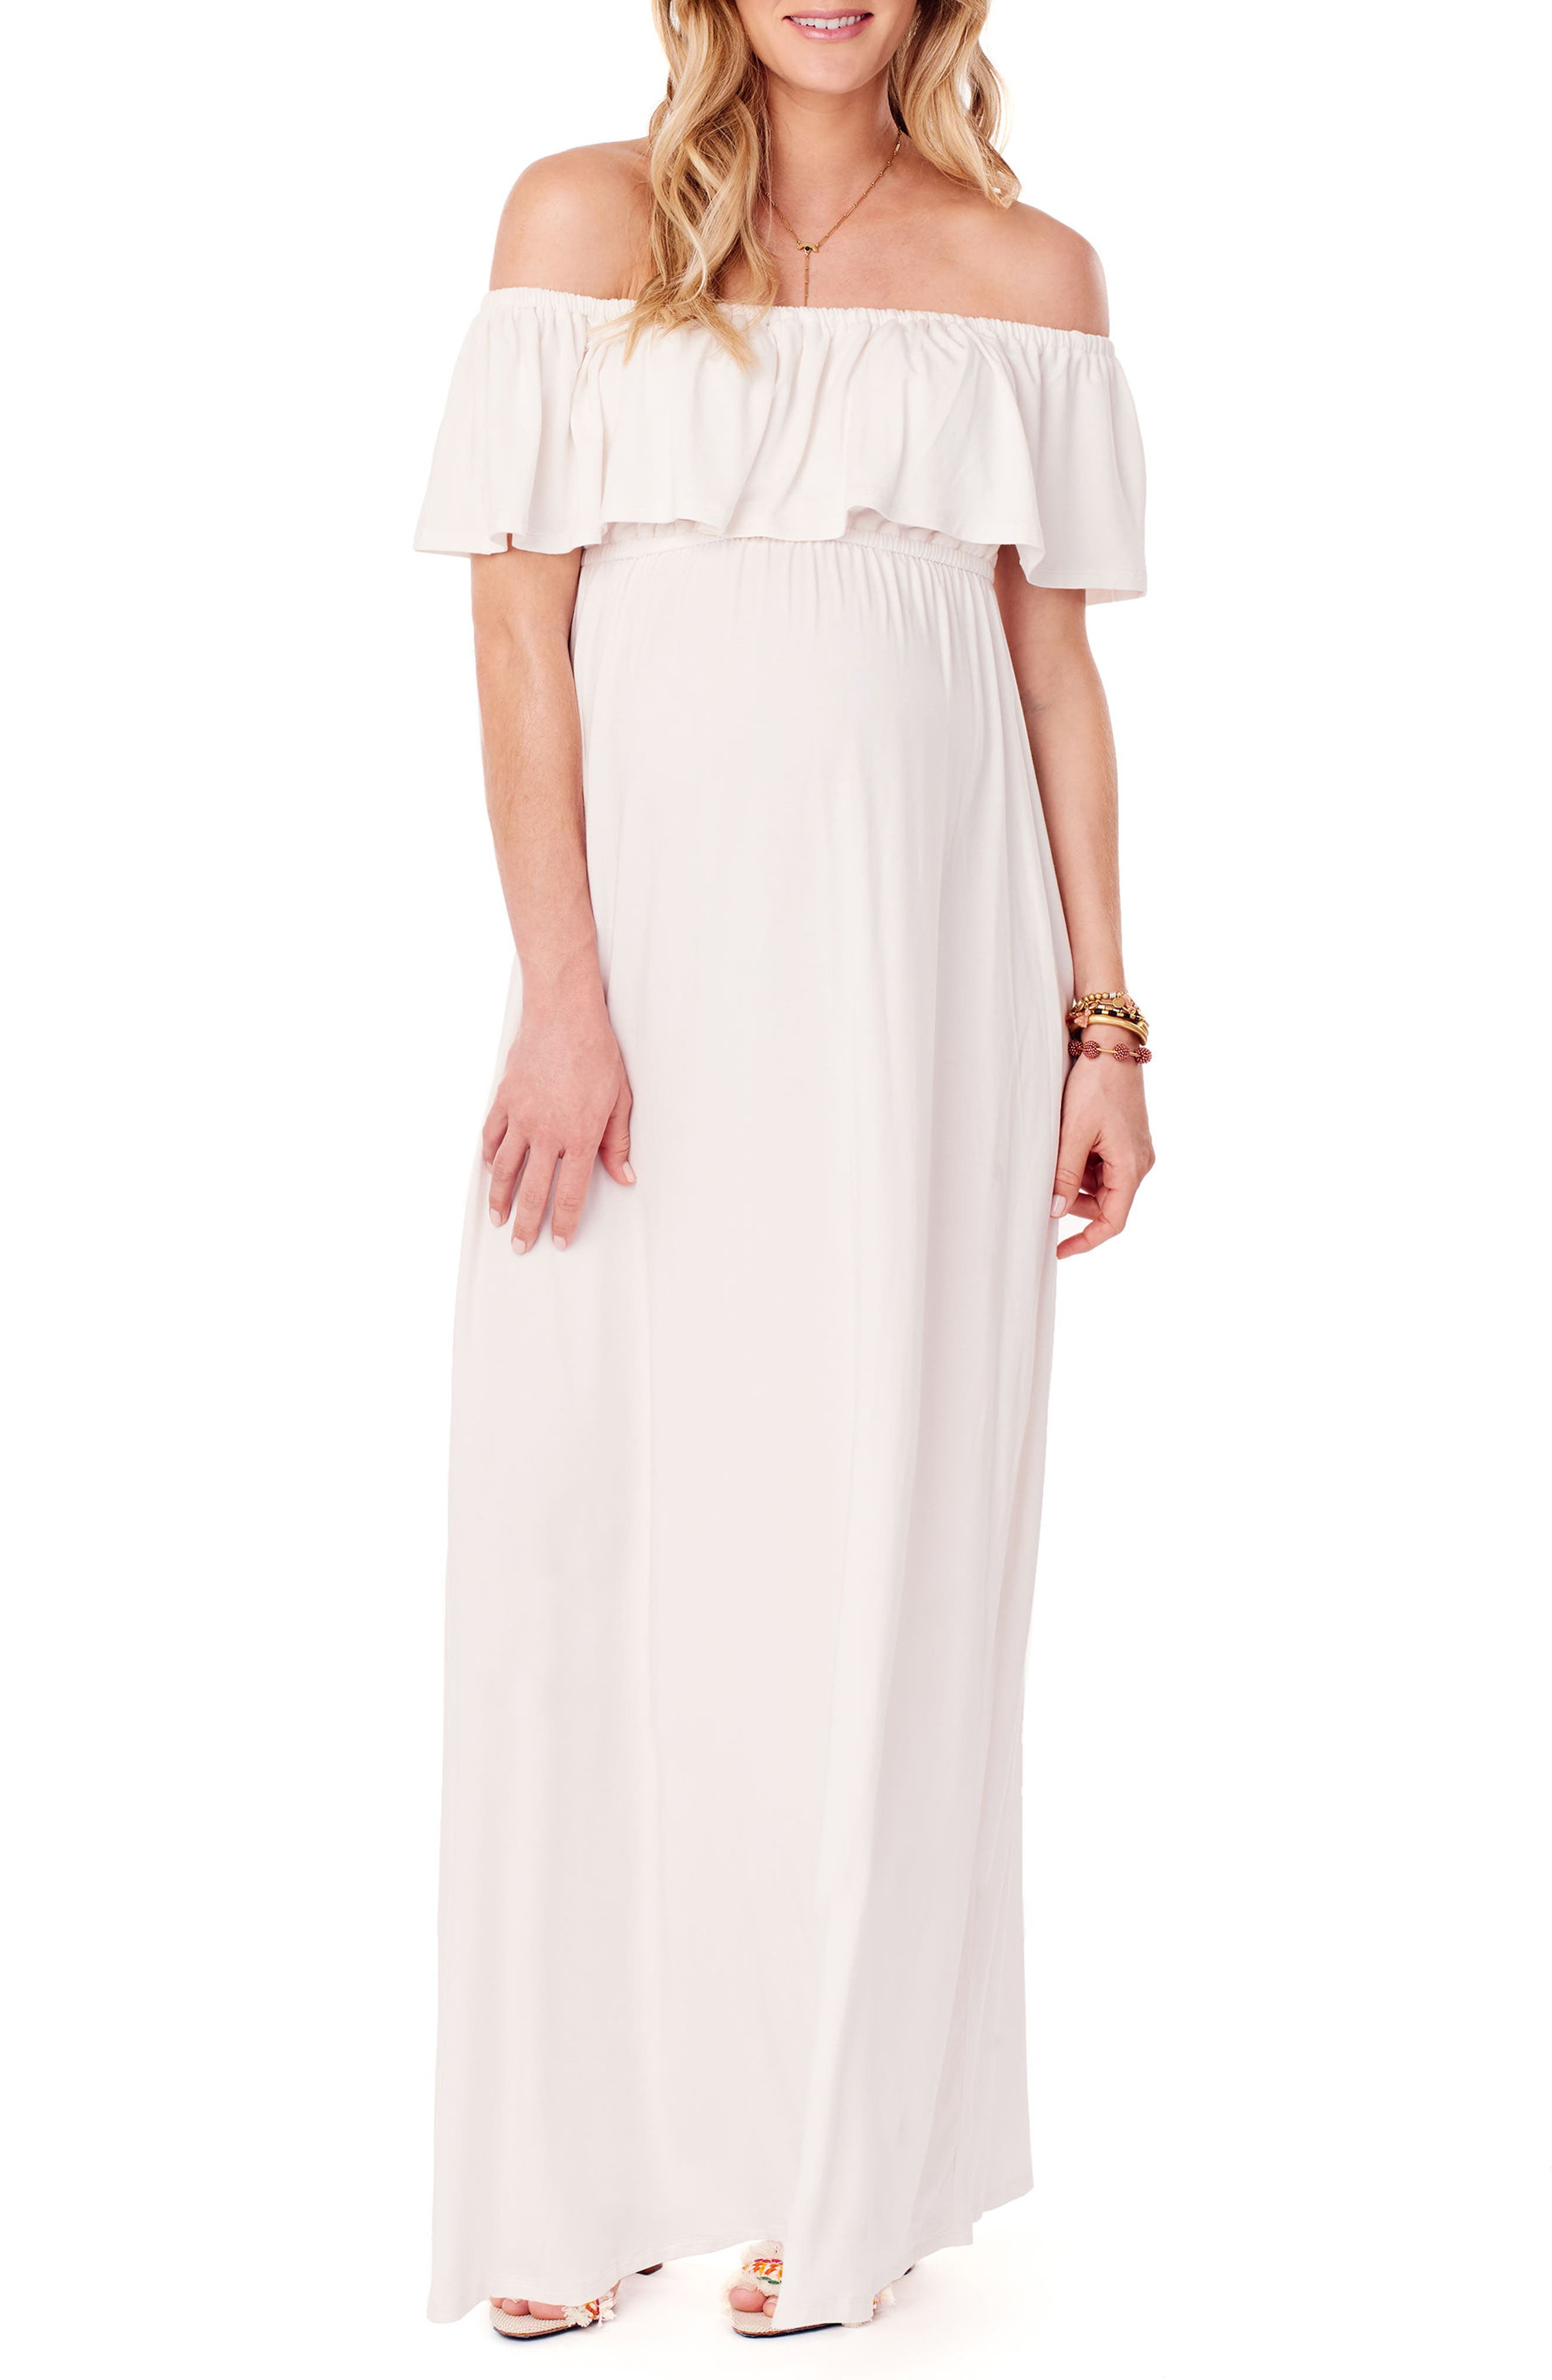 Ingrid & Isabel Off The Shoulder Maternity Maxi Dress, White